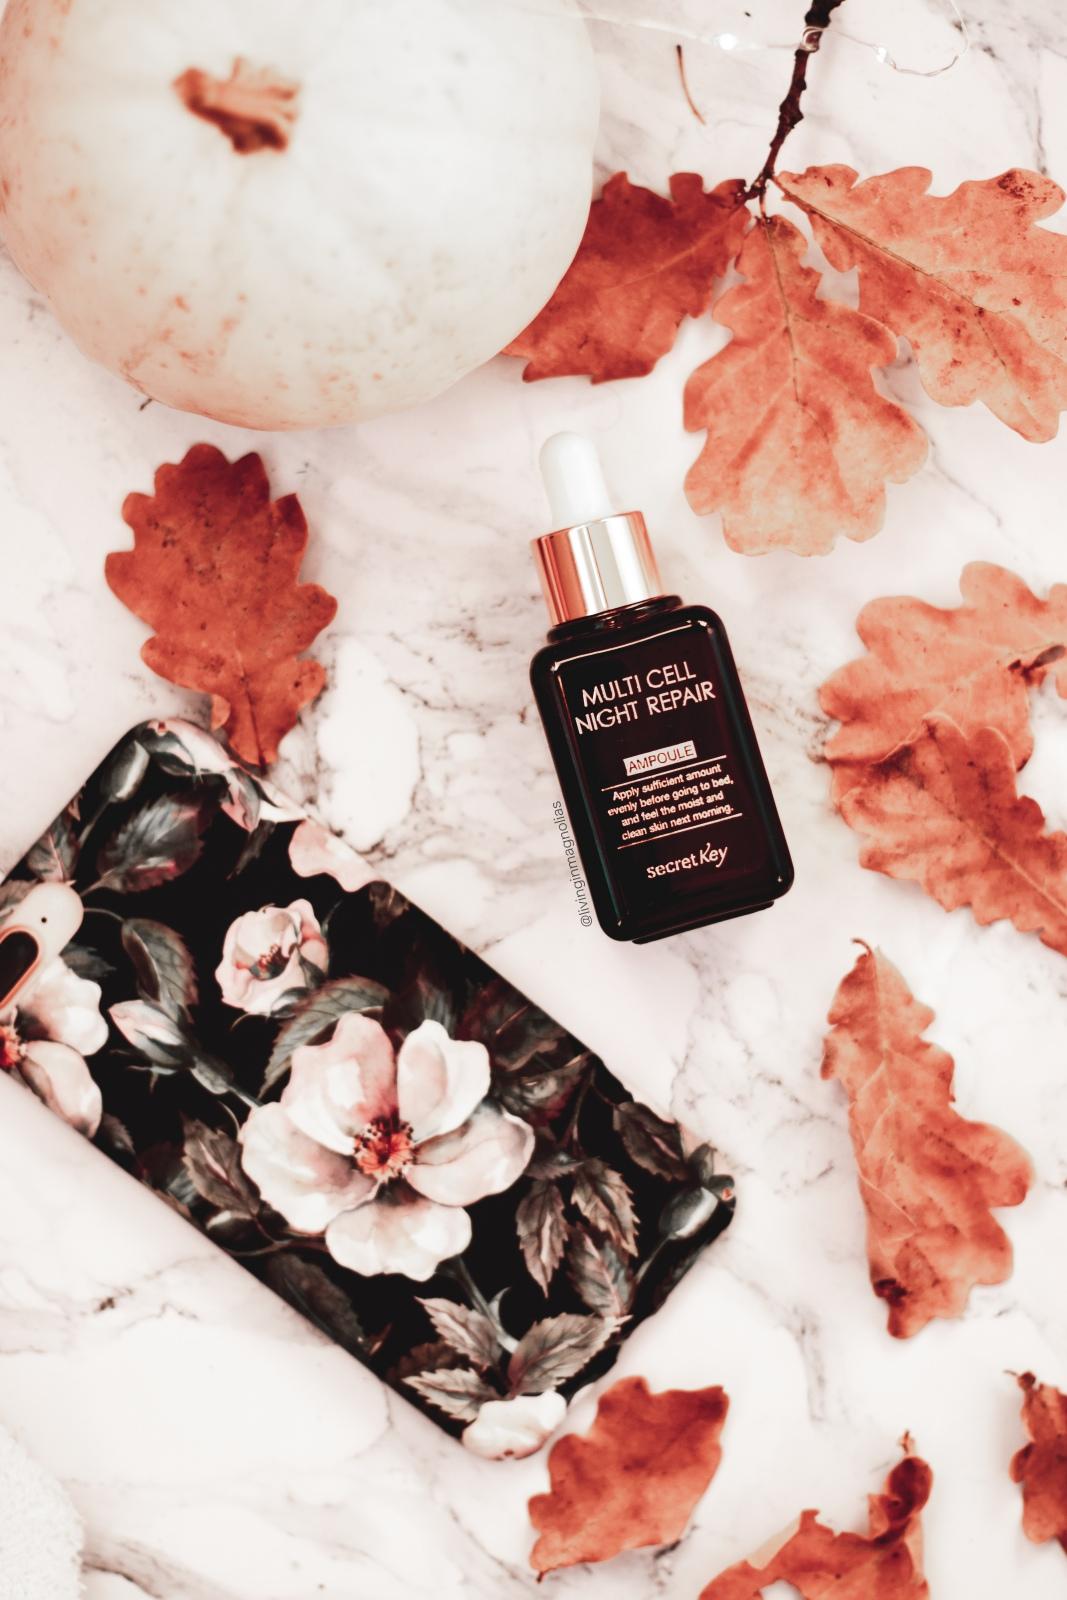 Autumn vibe how to save money jesien jak oszczedzac secret key multi cell night repair